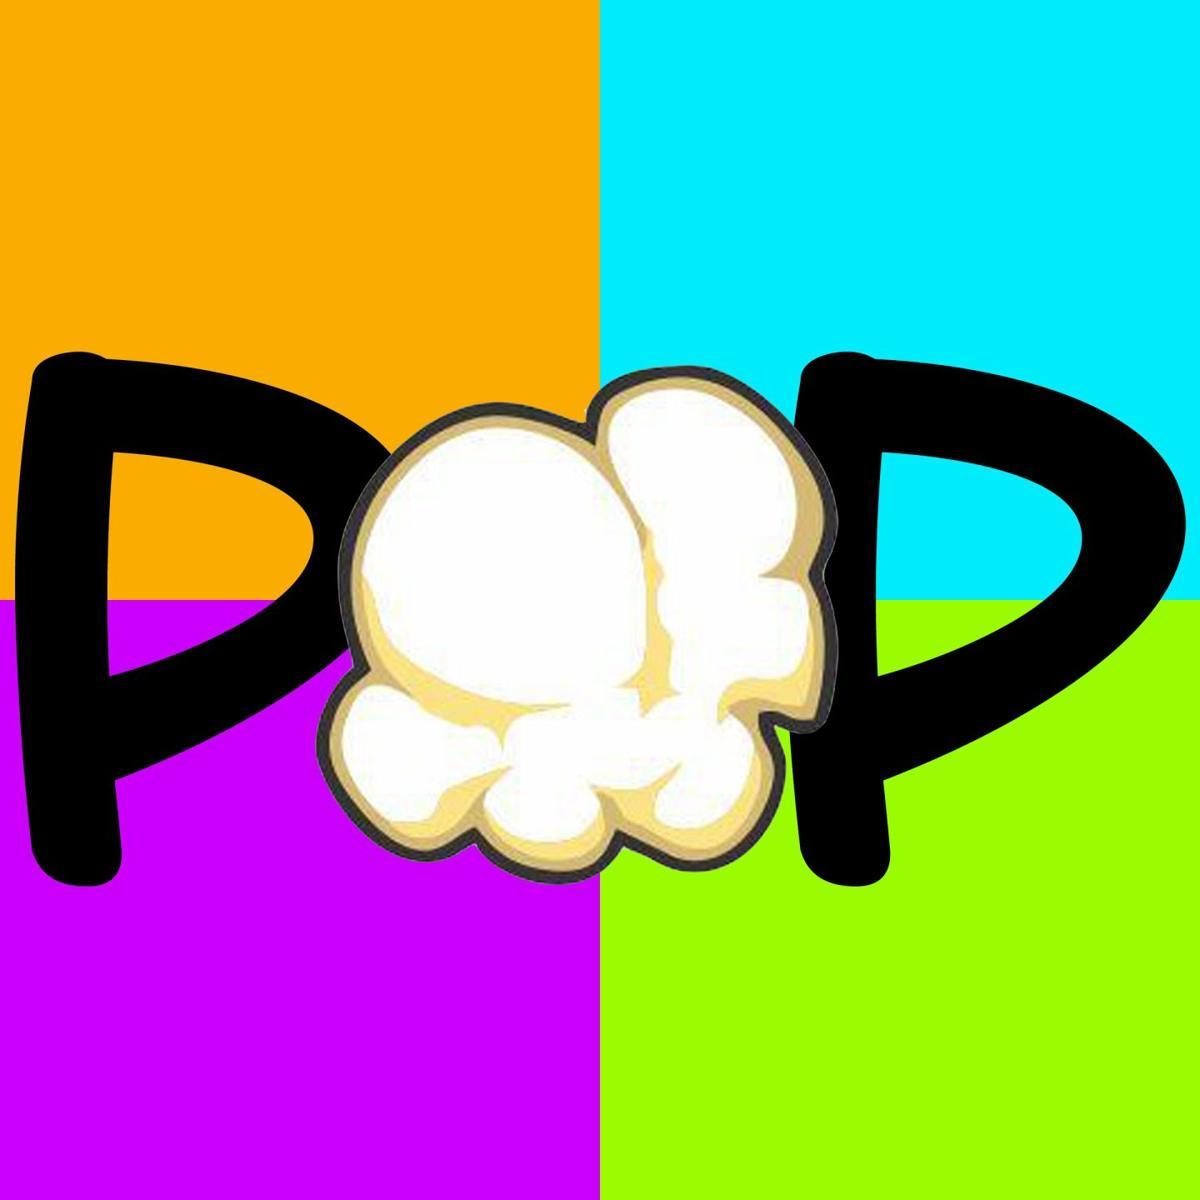 PopLogo.jpg